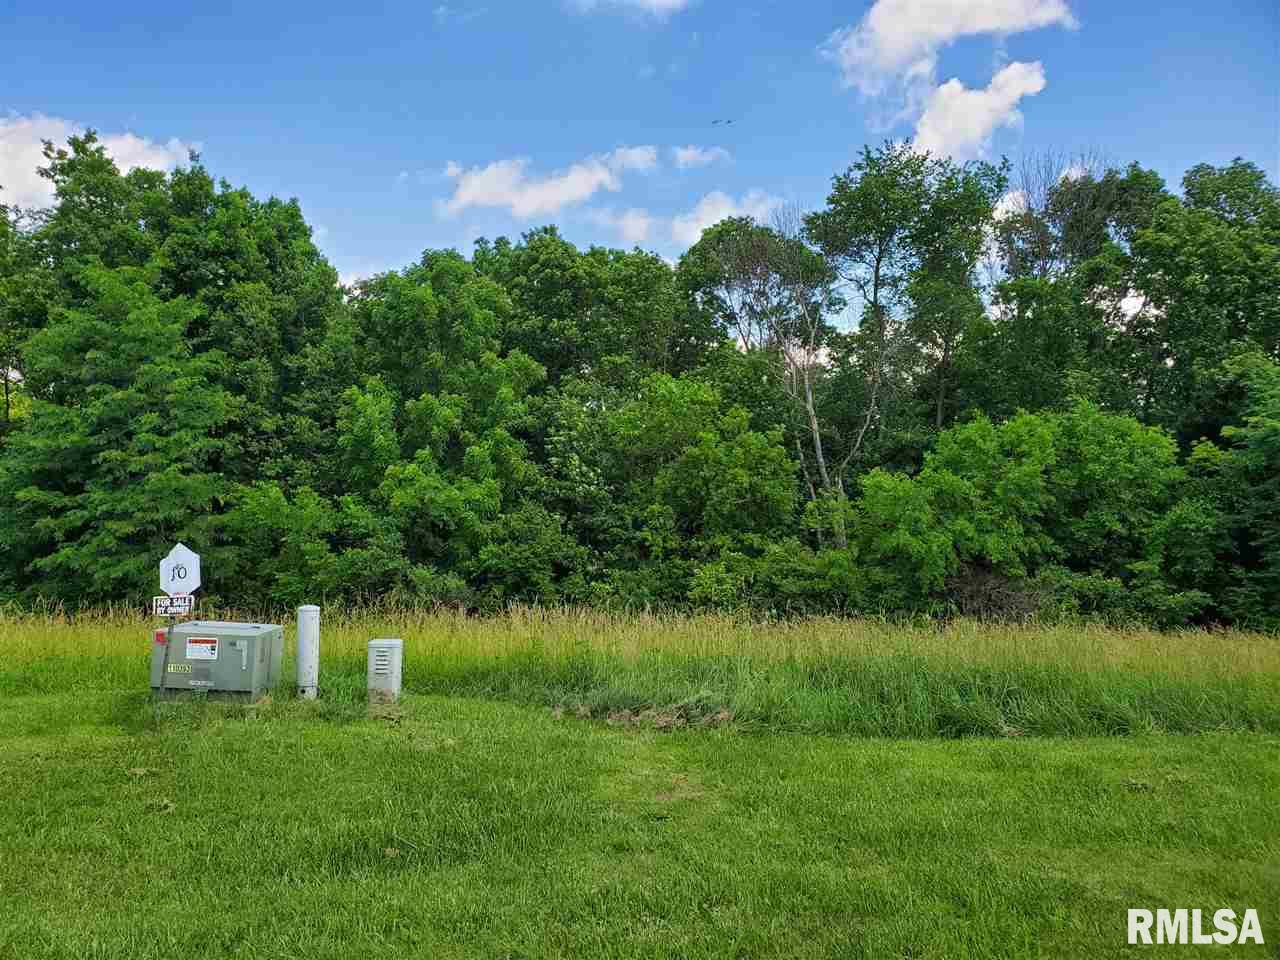 TBD Lot #10 POWELL Property Photo - Savanna, IL real estate listing